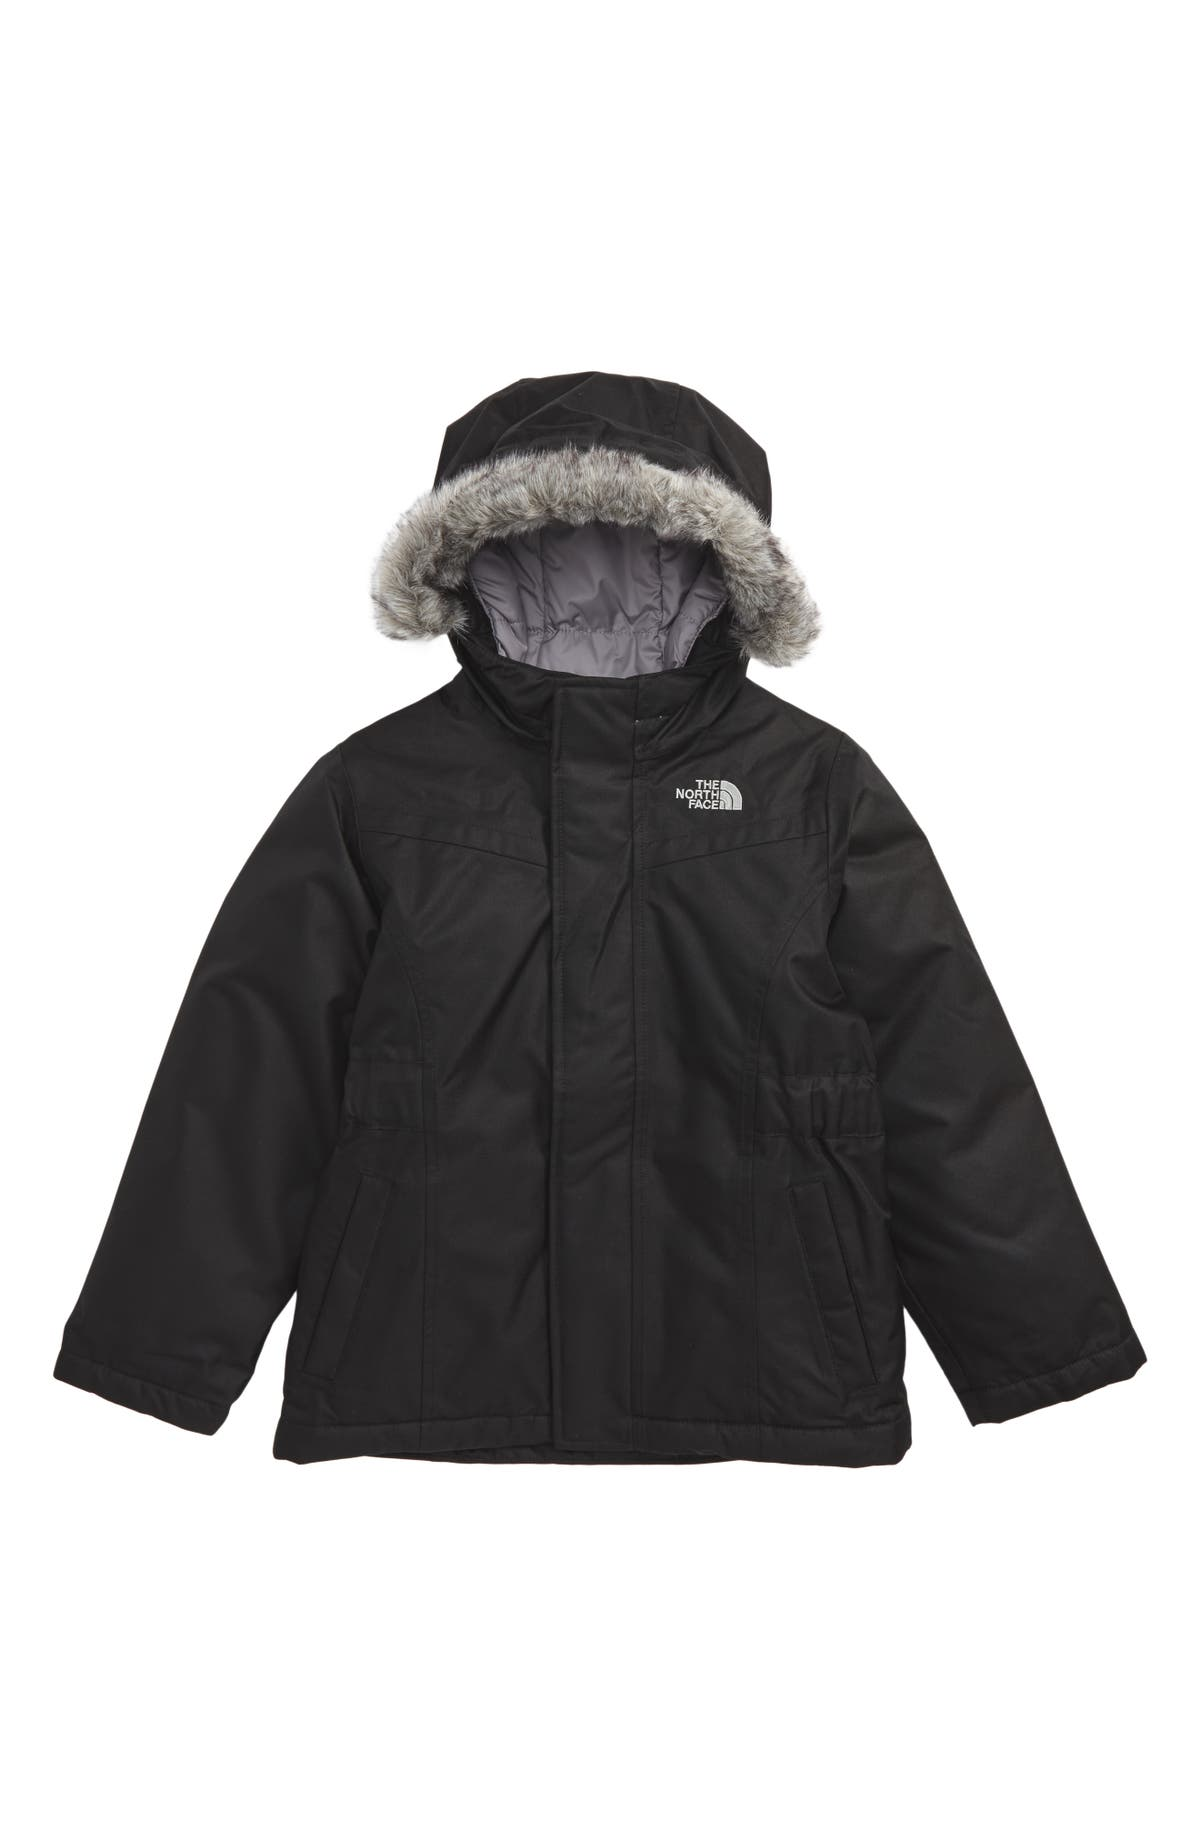 6df0bf847 Greenland Waterproof 550-Fill Down Jacket